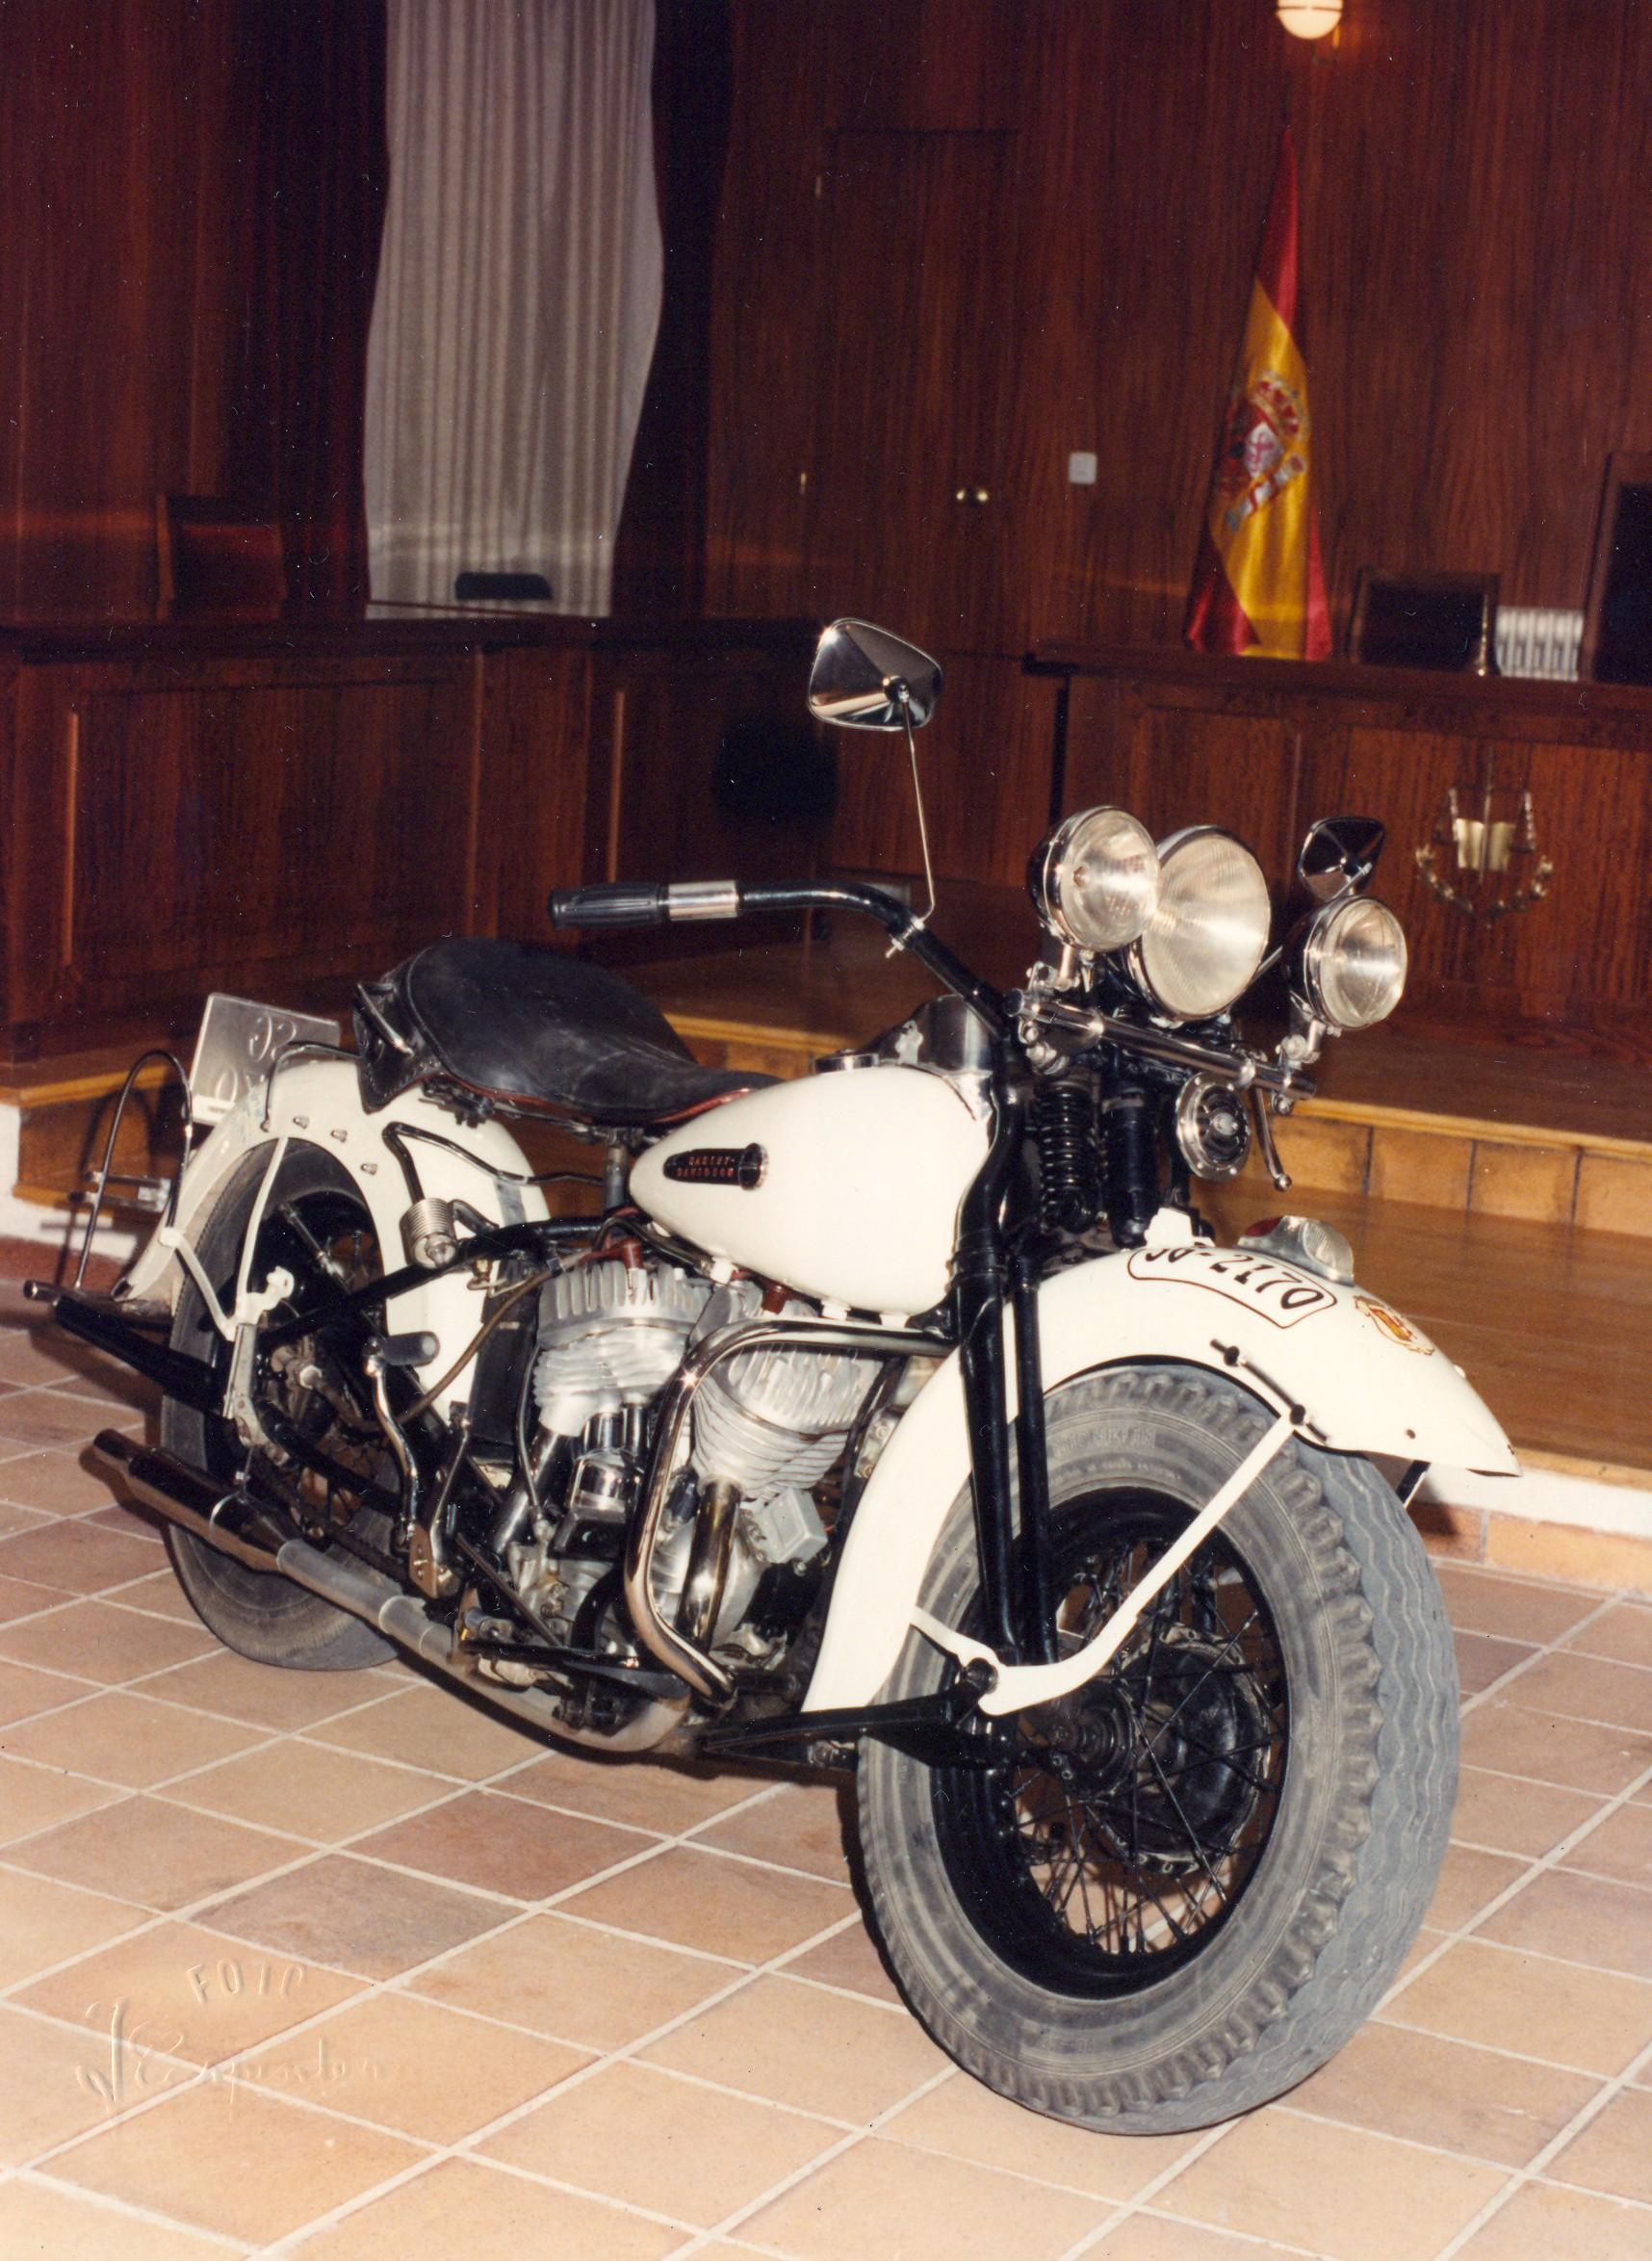 1990 - Harley-Davidson WL45 (Vista dcha)